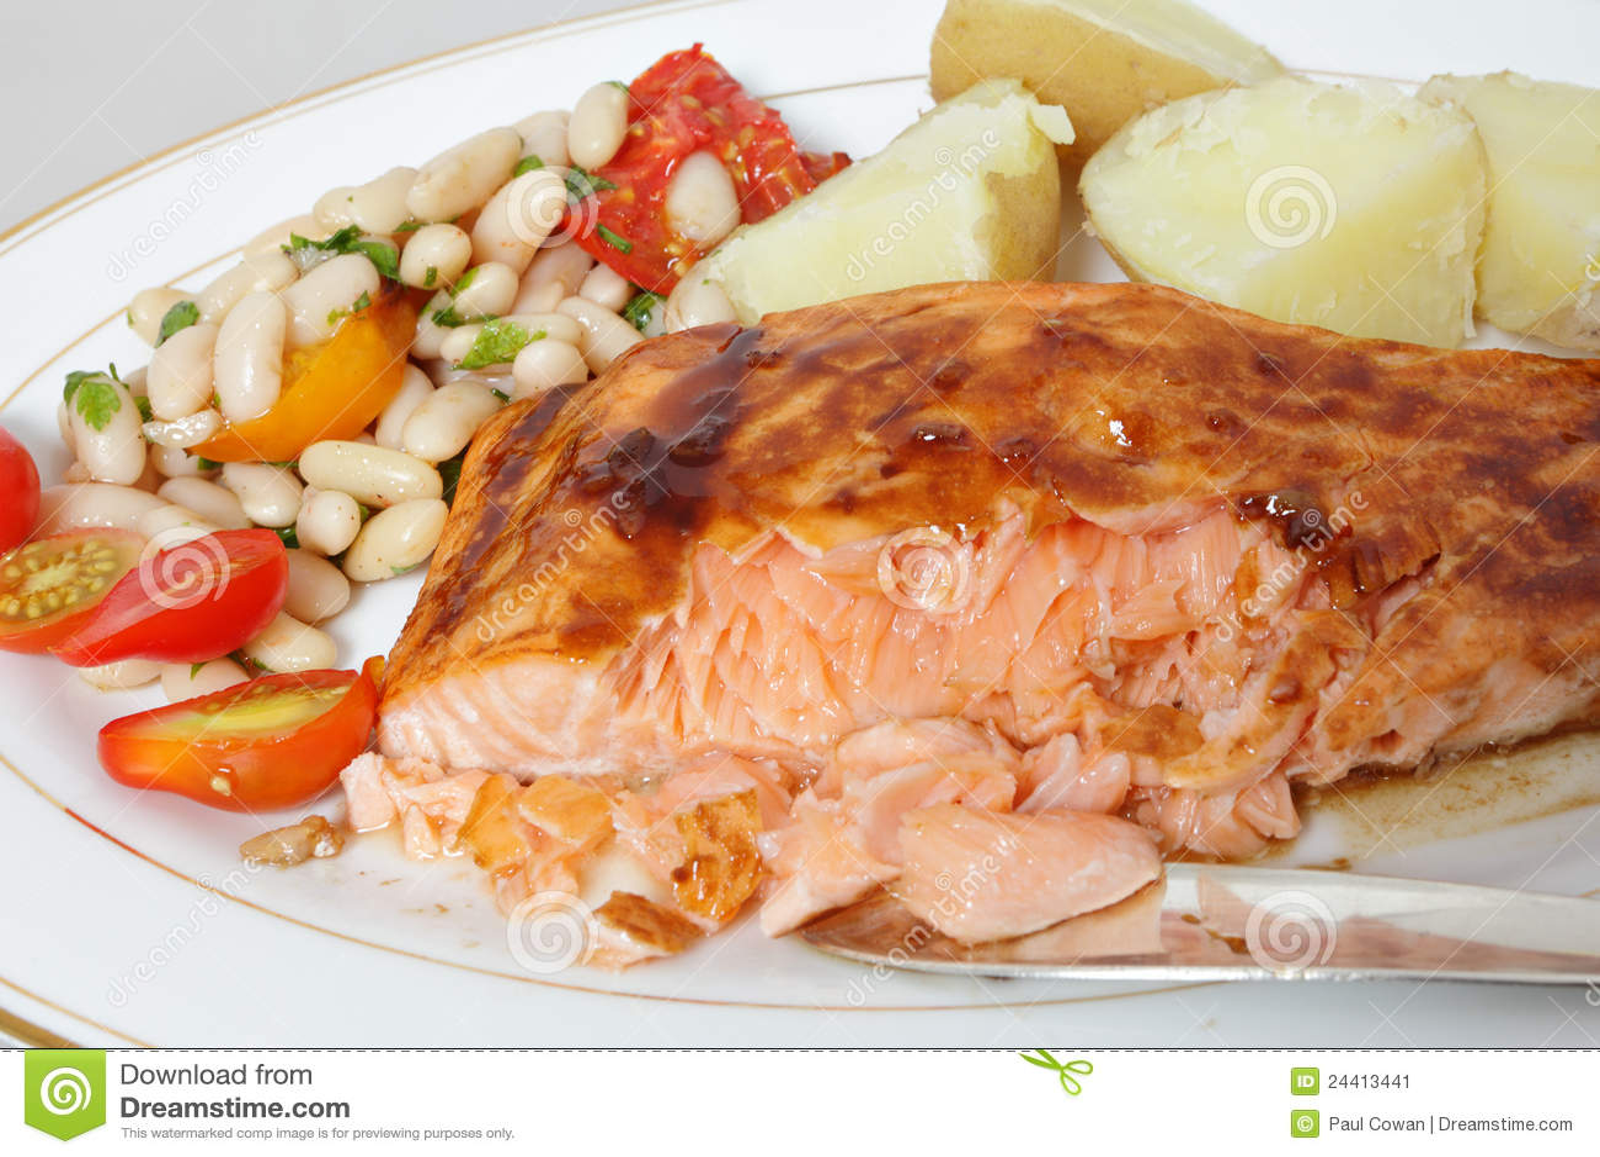 Balsamic Glazed Salmon Fillet Stock Image - Image: 24413441